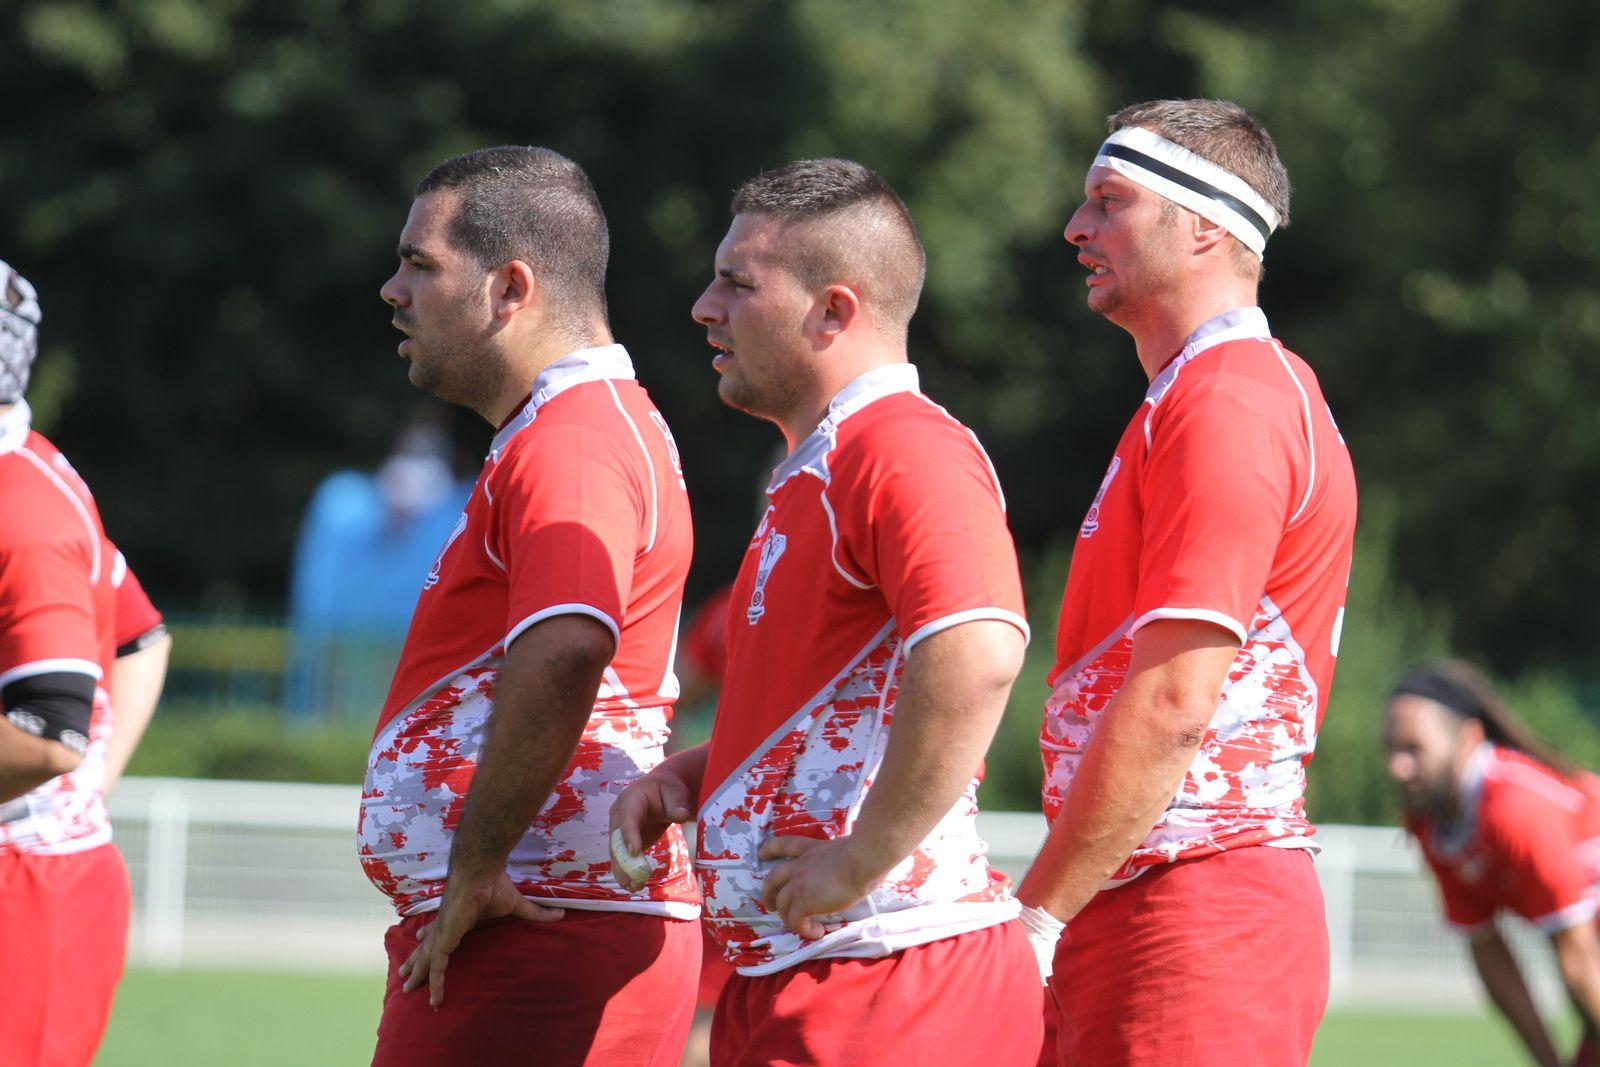 L'USV Rugby sera à la relance ce dimanche contre l'AS Roanne